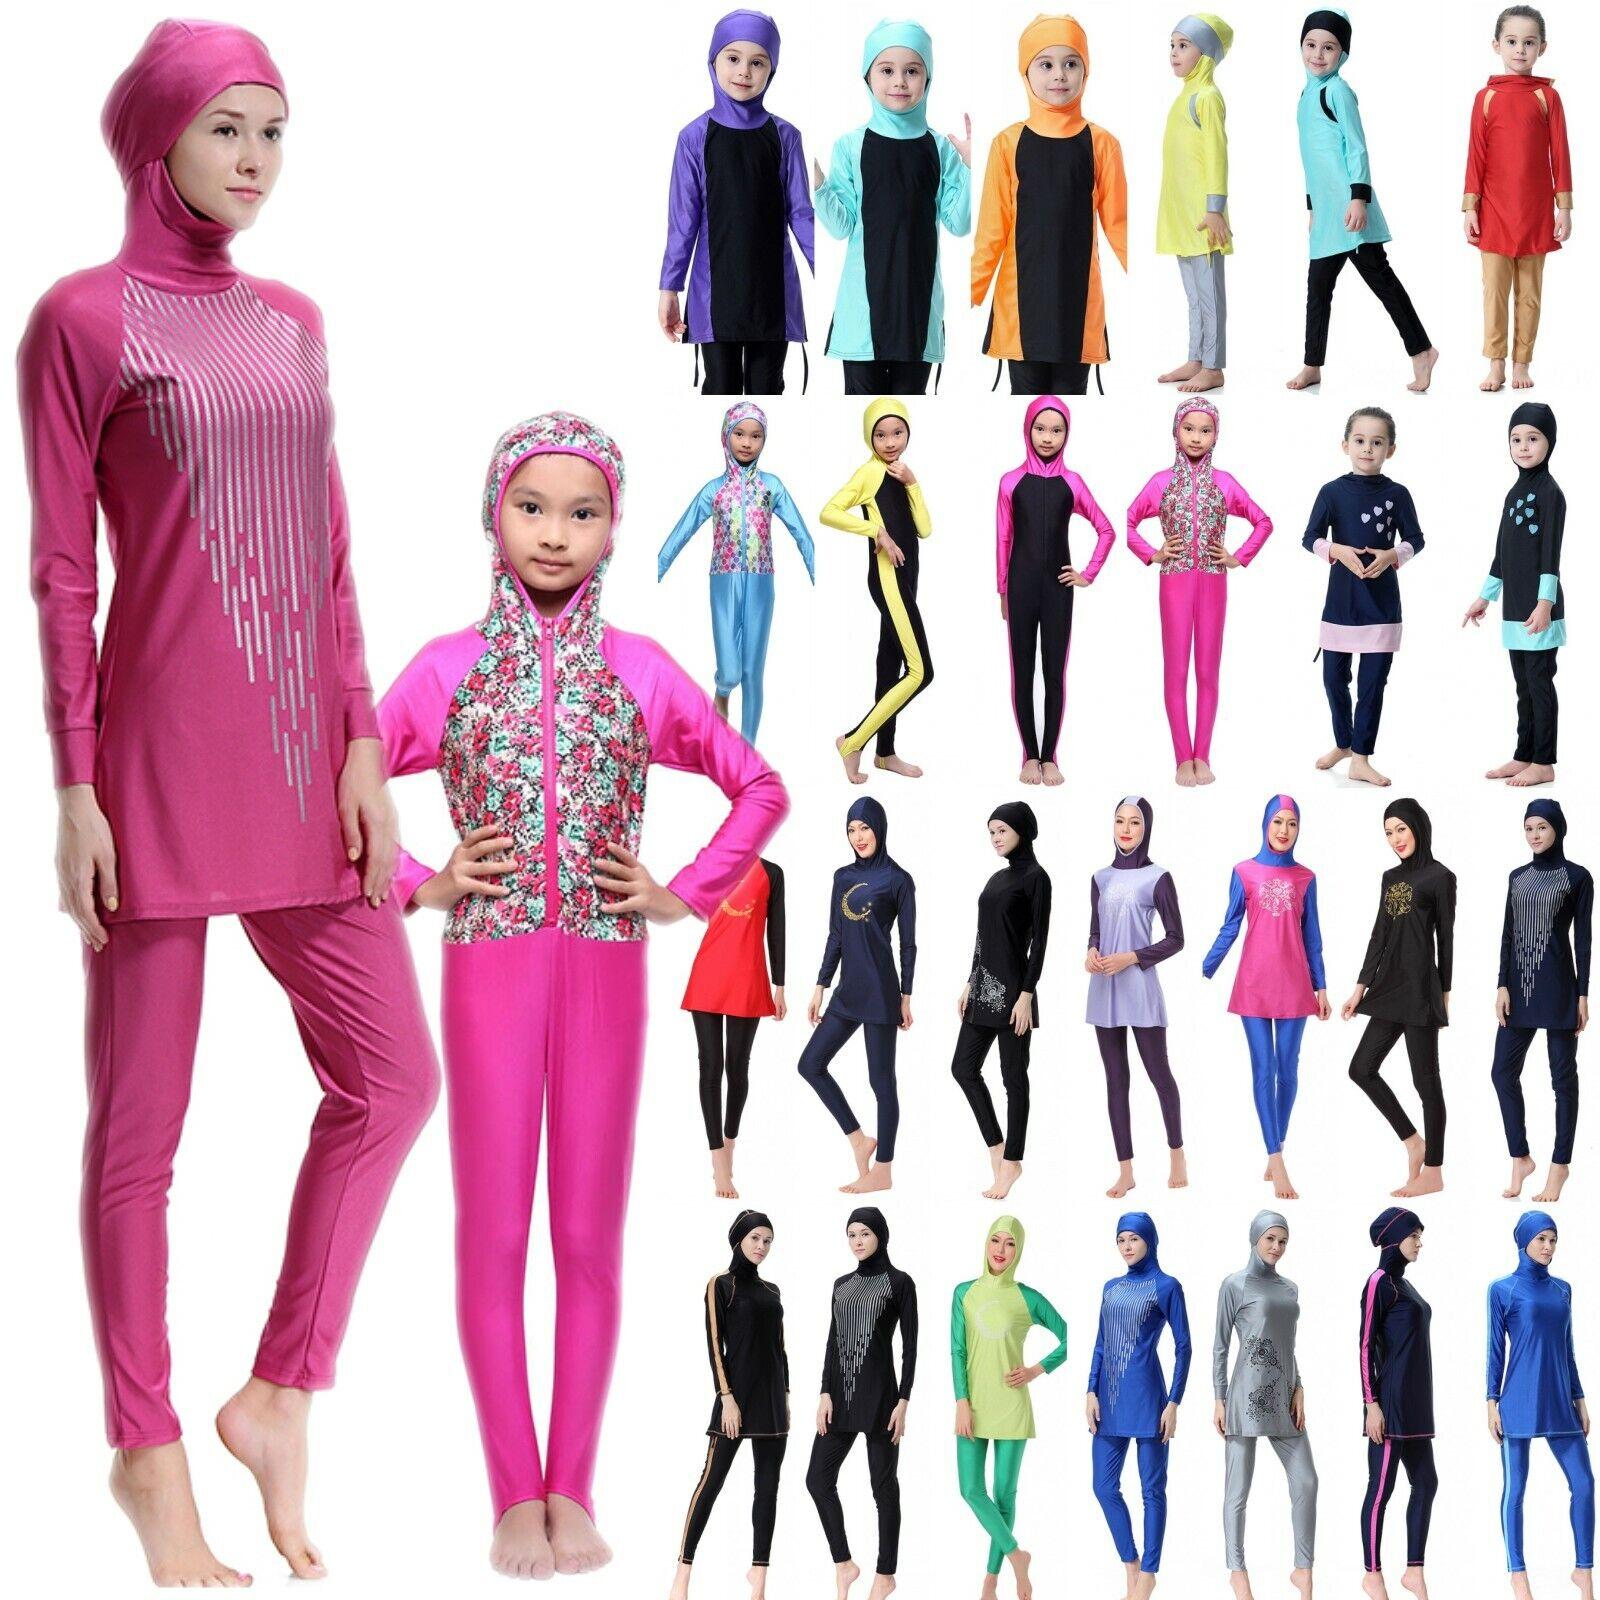 Muslimische Damen Kids Islamische Bademode Modest Full Cover Badeanzug Burkini.